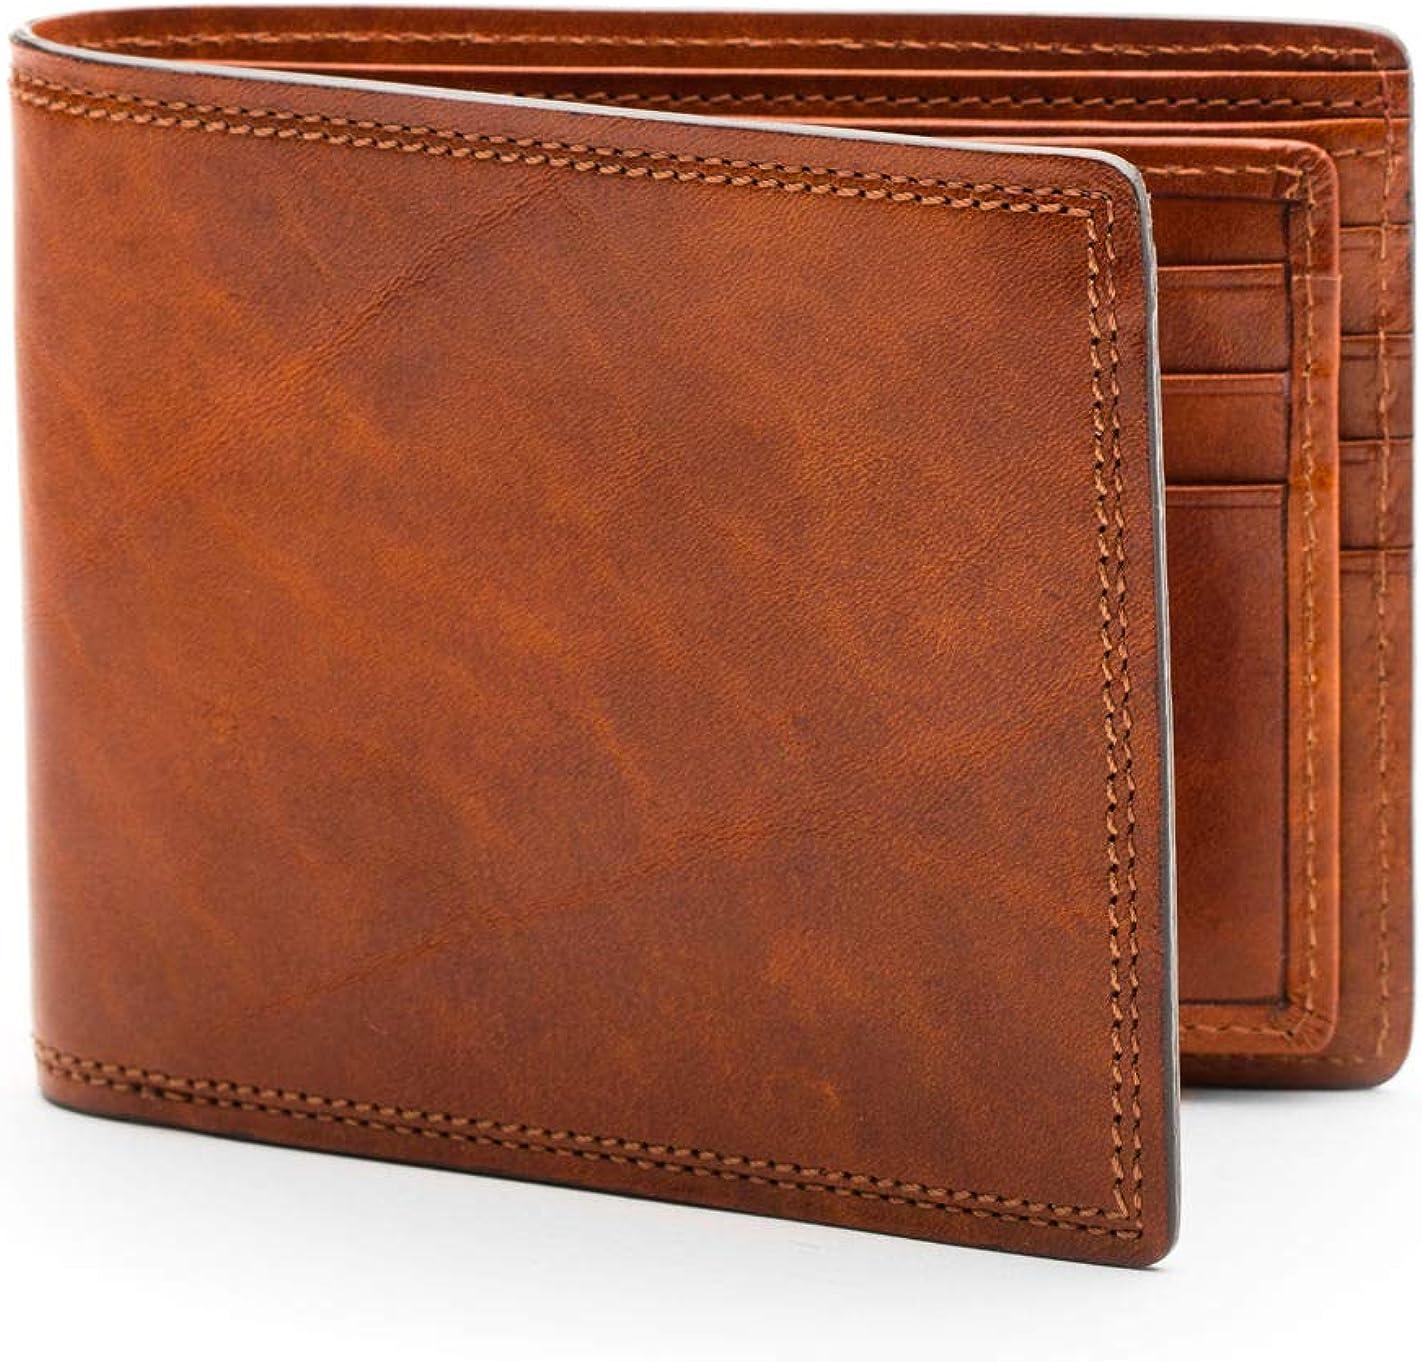 Bosca Dolce Collection - Eight-Pocket Deluxe Executive Wallet w/Passcase